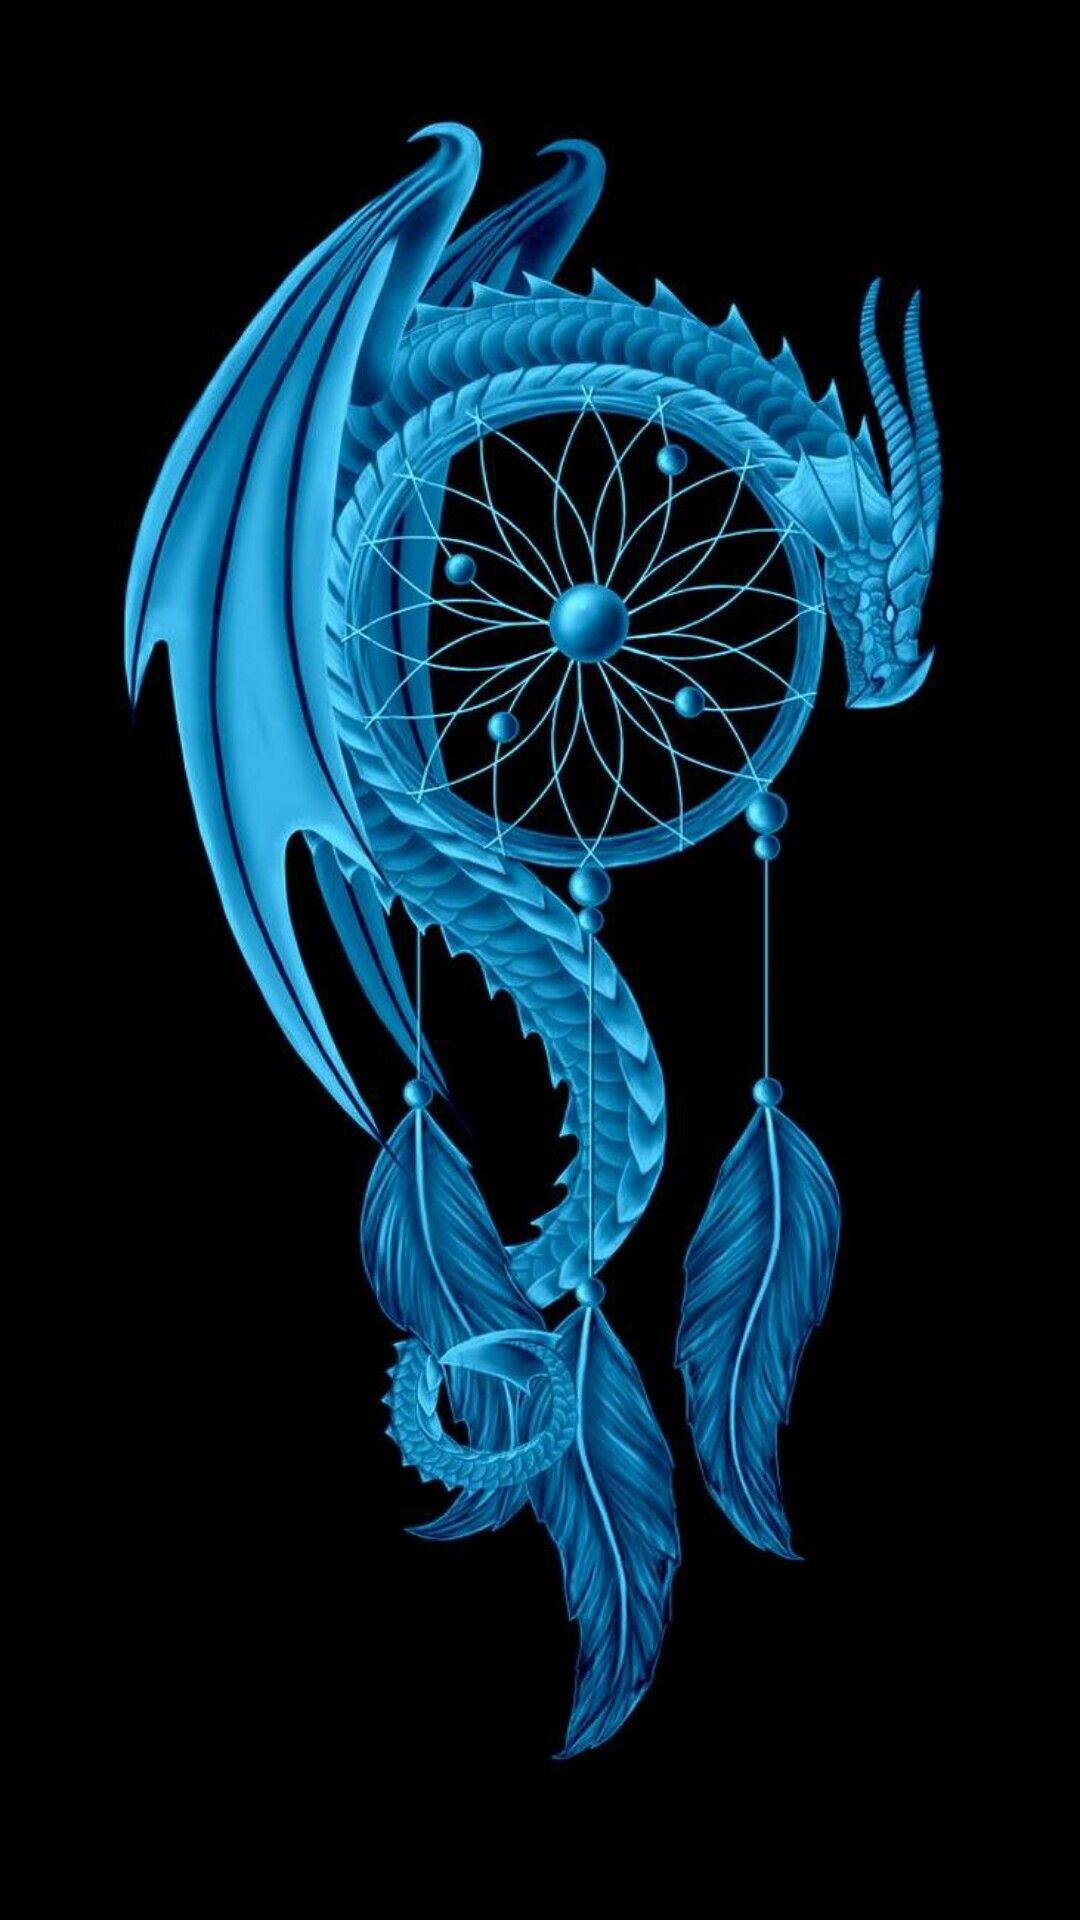 Pin By Michelle Buffington On Phone Backgrounds 30 Blue Dragon Tattoo Dragon Art Dragon Tattoo Designs Live wallpaper dragon tattoo